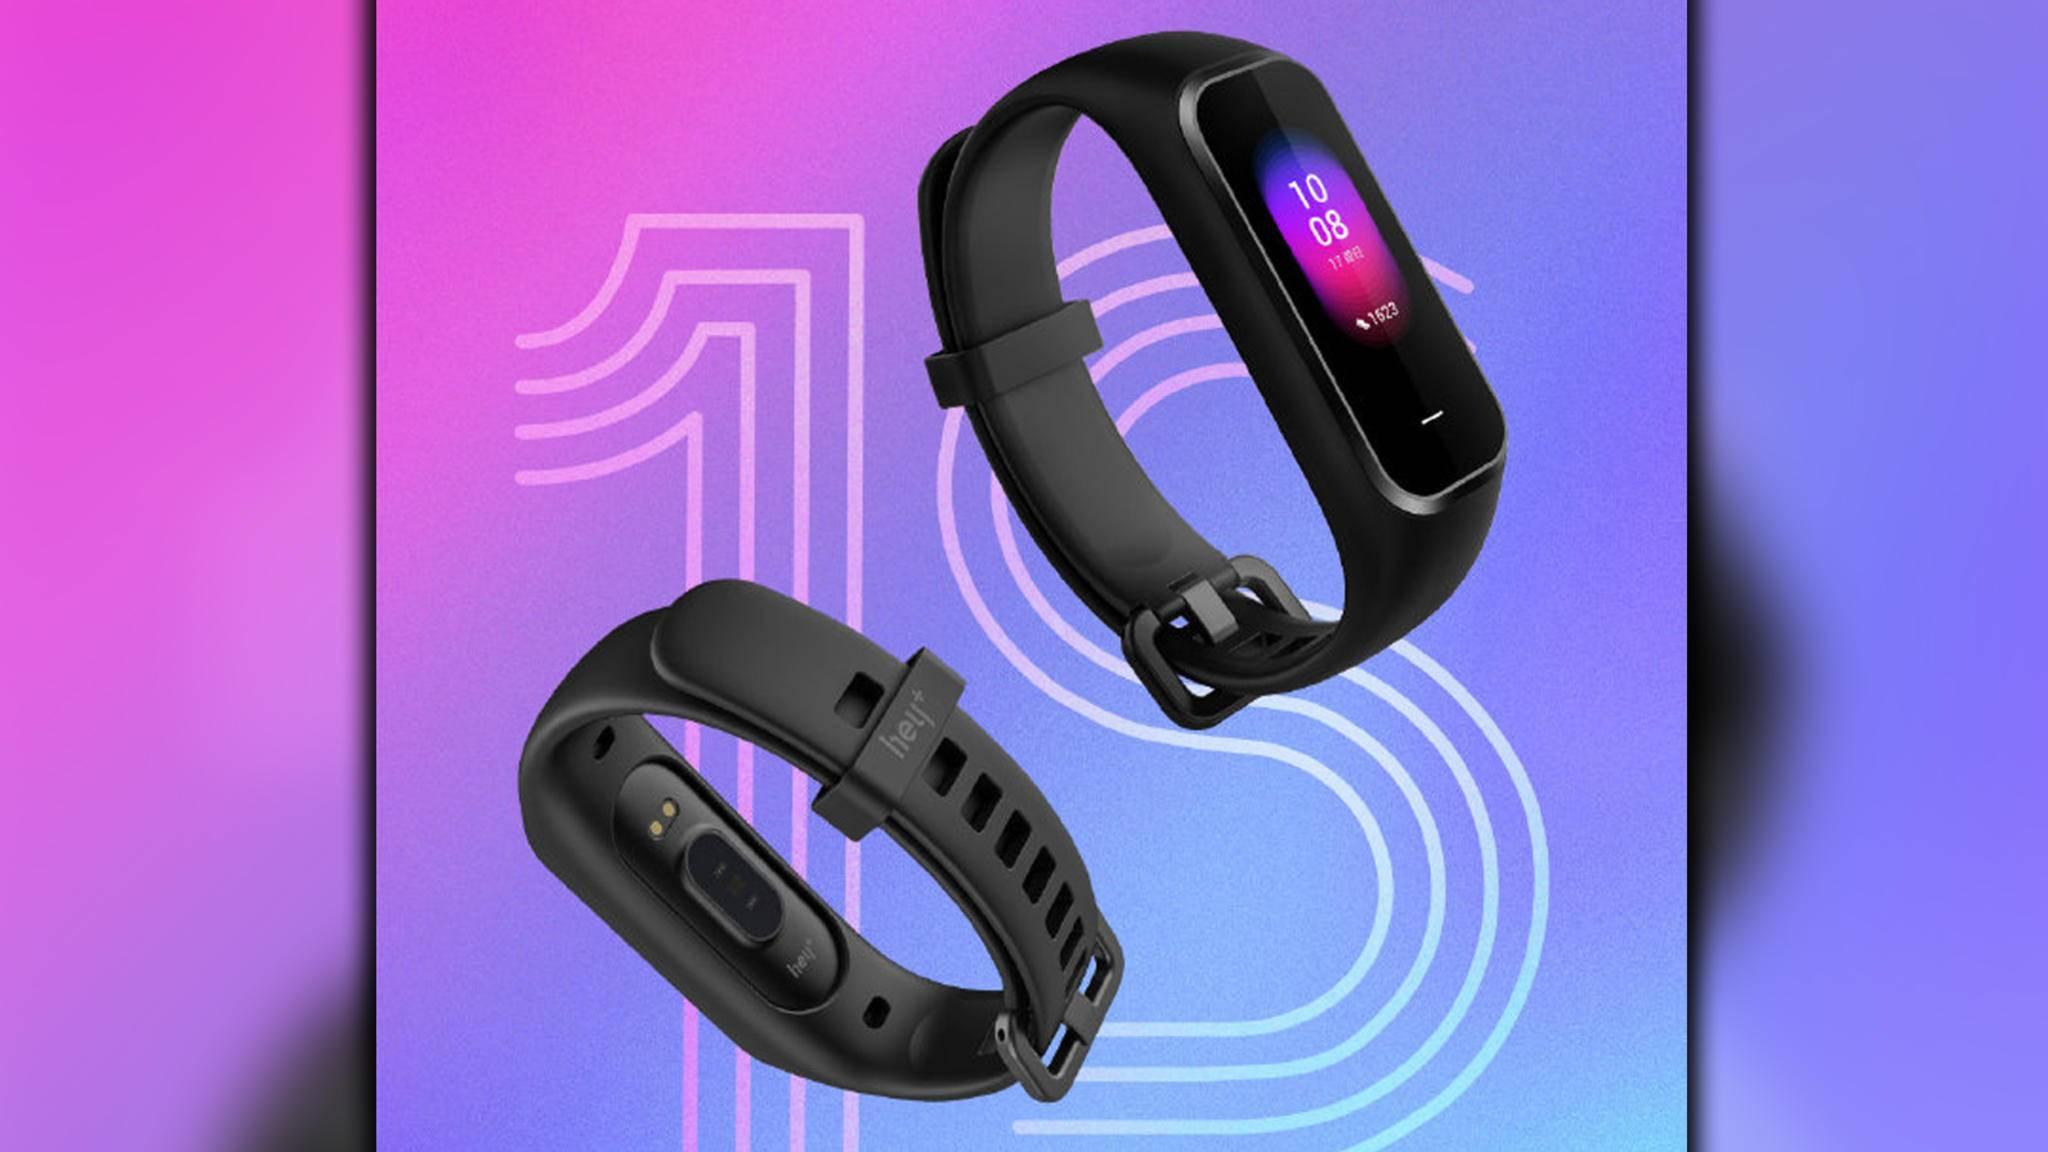 Xiaomi Hey+ 1S Fitness-Tracker Smart Band-hey+-Weibo